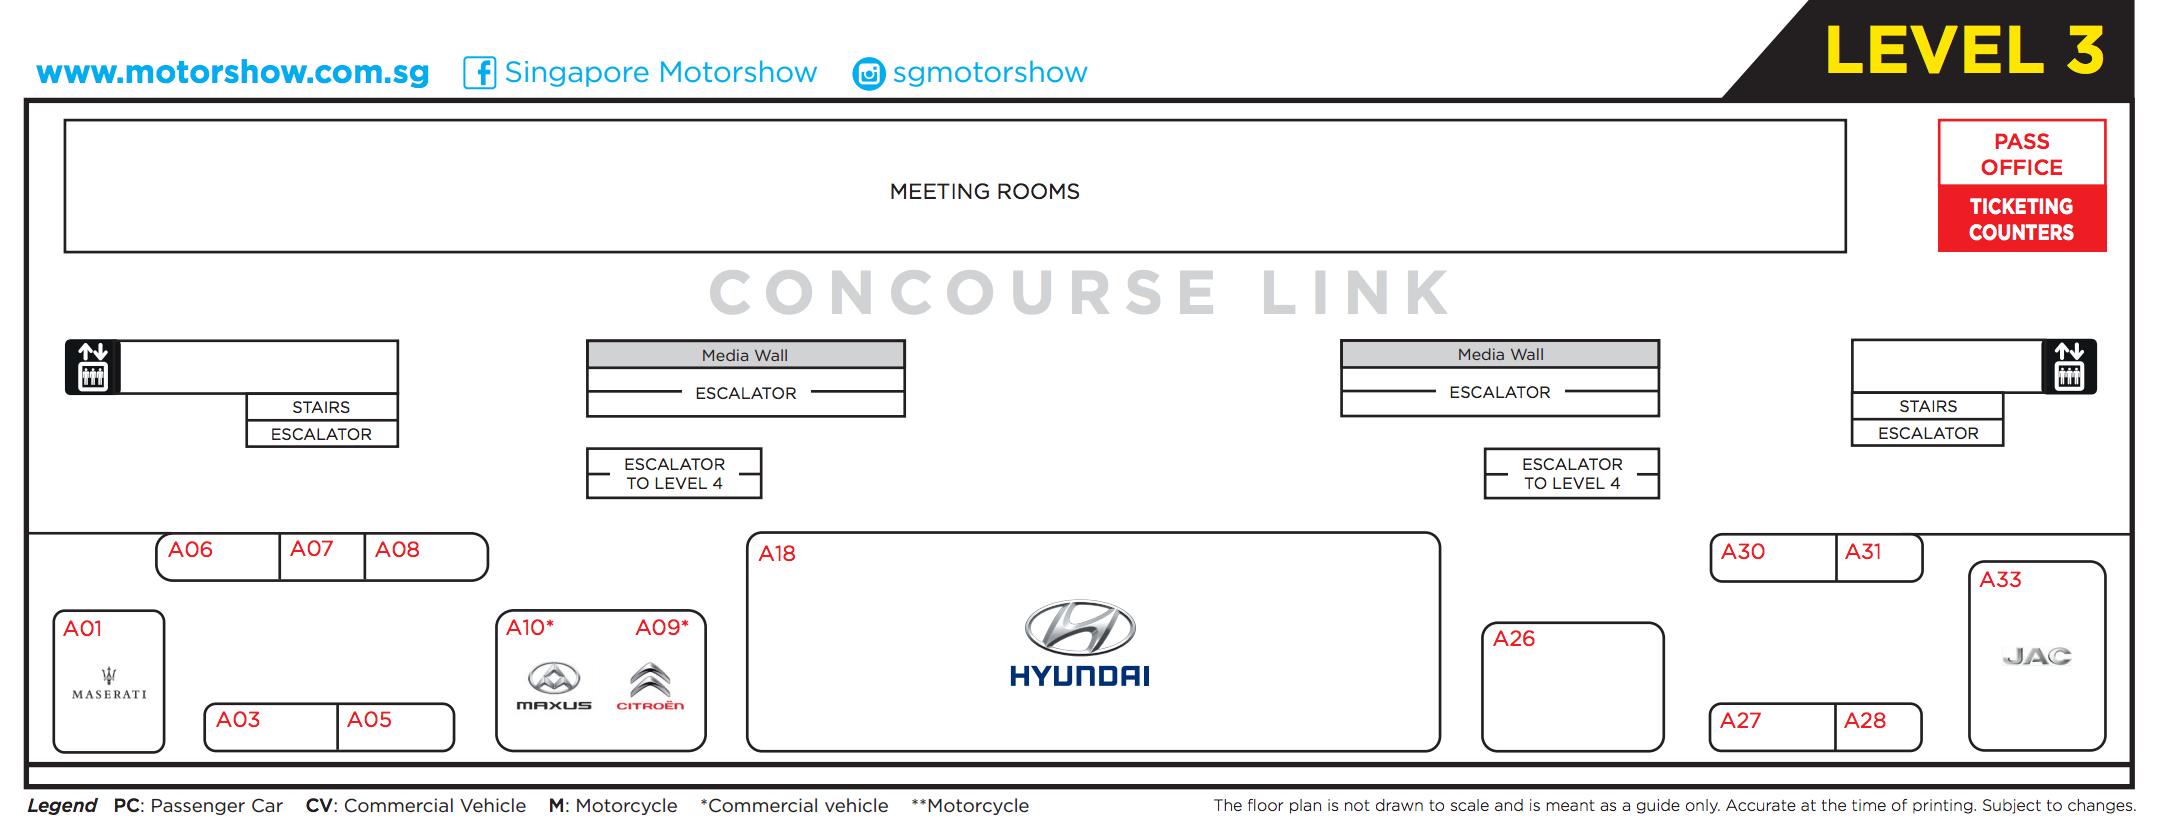 Singapore Motorshow 2017 Floor Plan Level 3